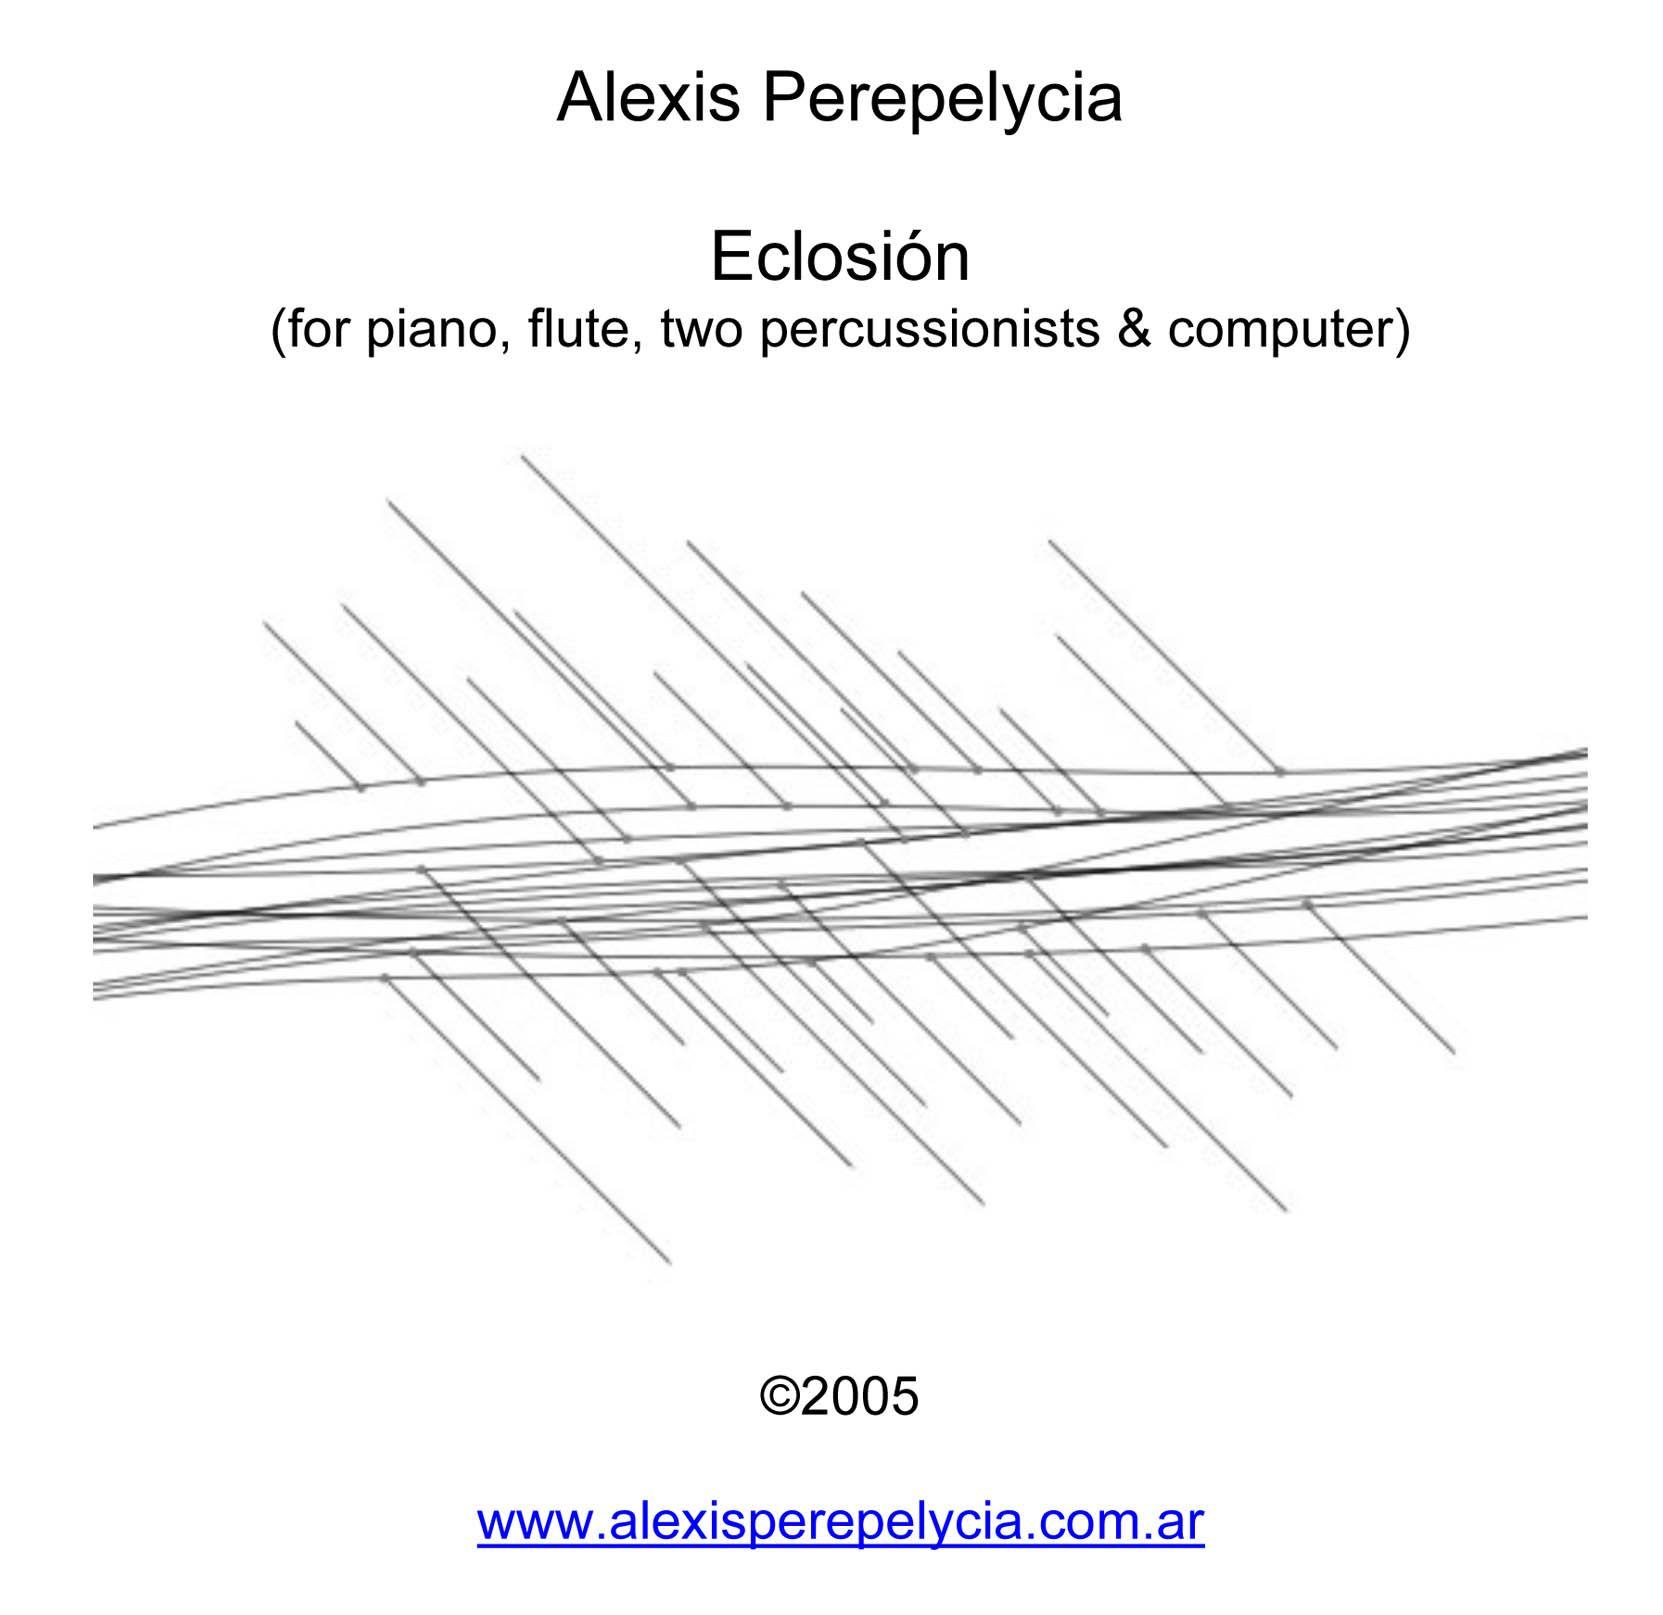 Alexis Perepelycia: Eclosion